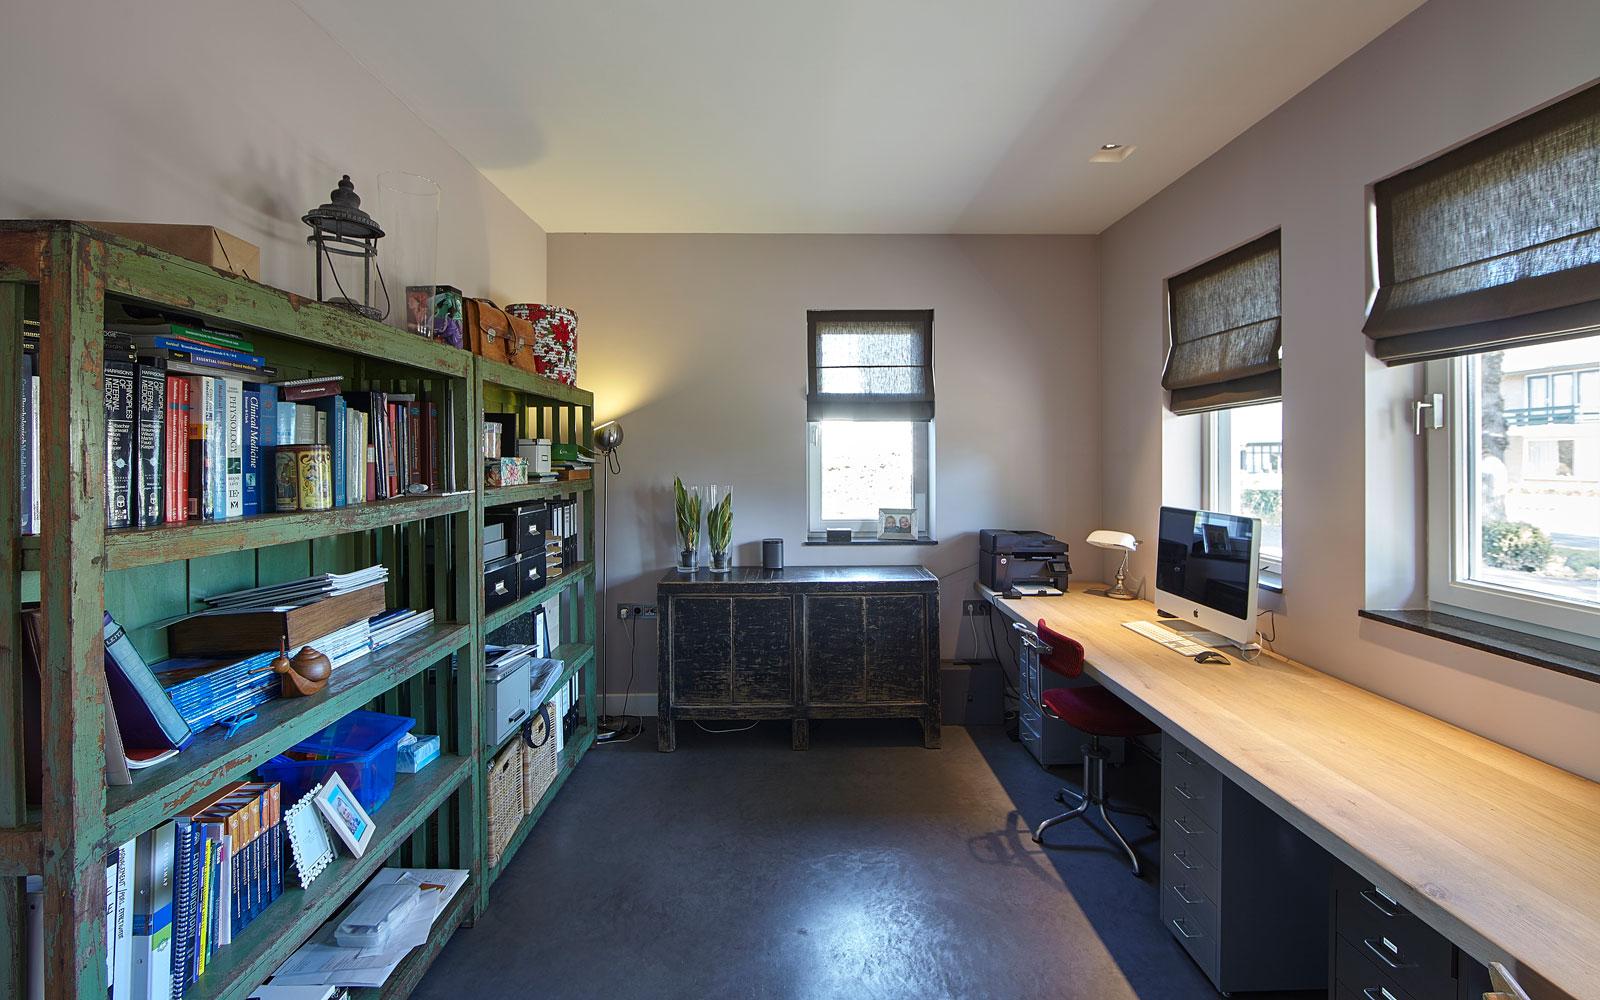 Werkruimte, kantoor, home office, beton vloer, boekenkast, lichtinval, landelijk, industrieel, Wolfs Architecten